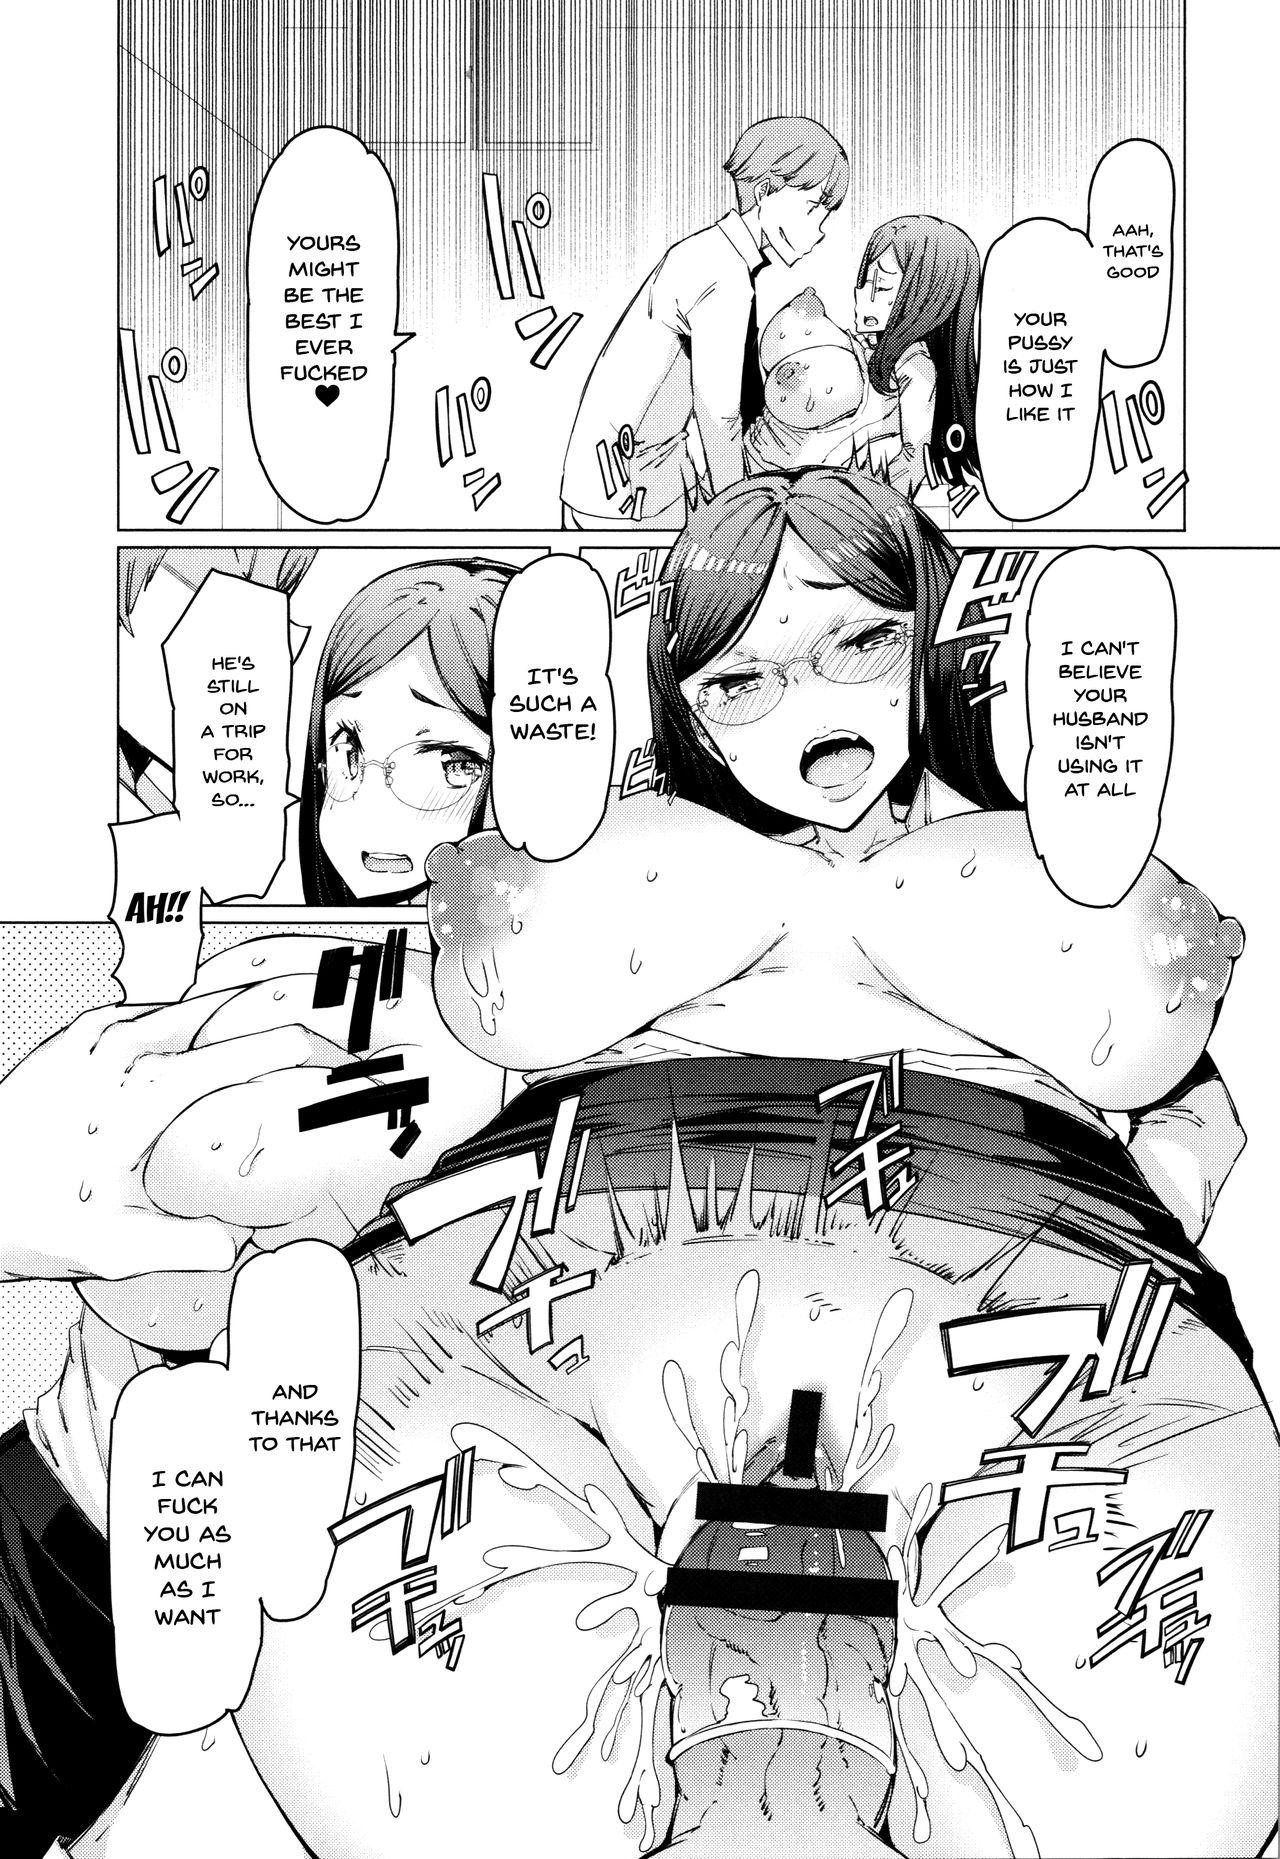 Hitozuma ga Ero Sugite Shigoto ni Naranai! | These Housewives Are Too Lewd I Can't Help It! Ch.1-7 42